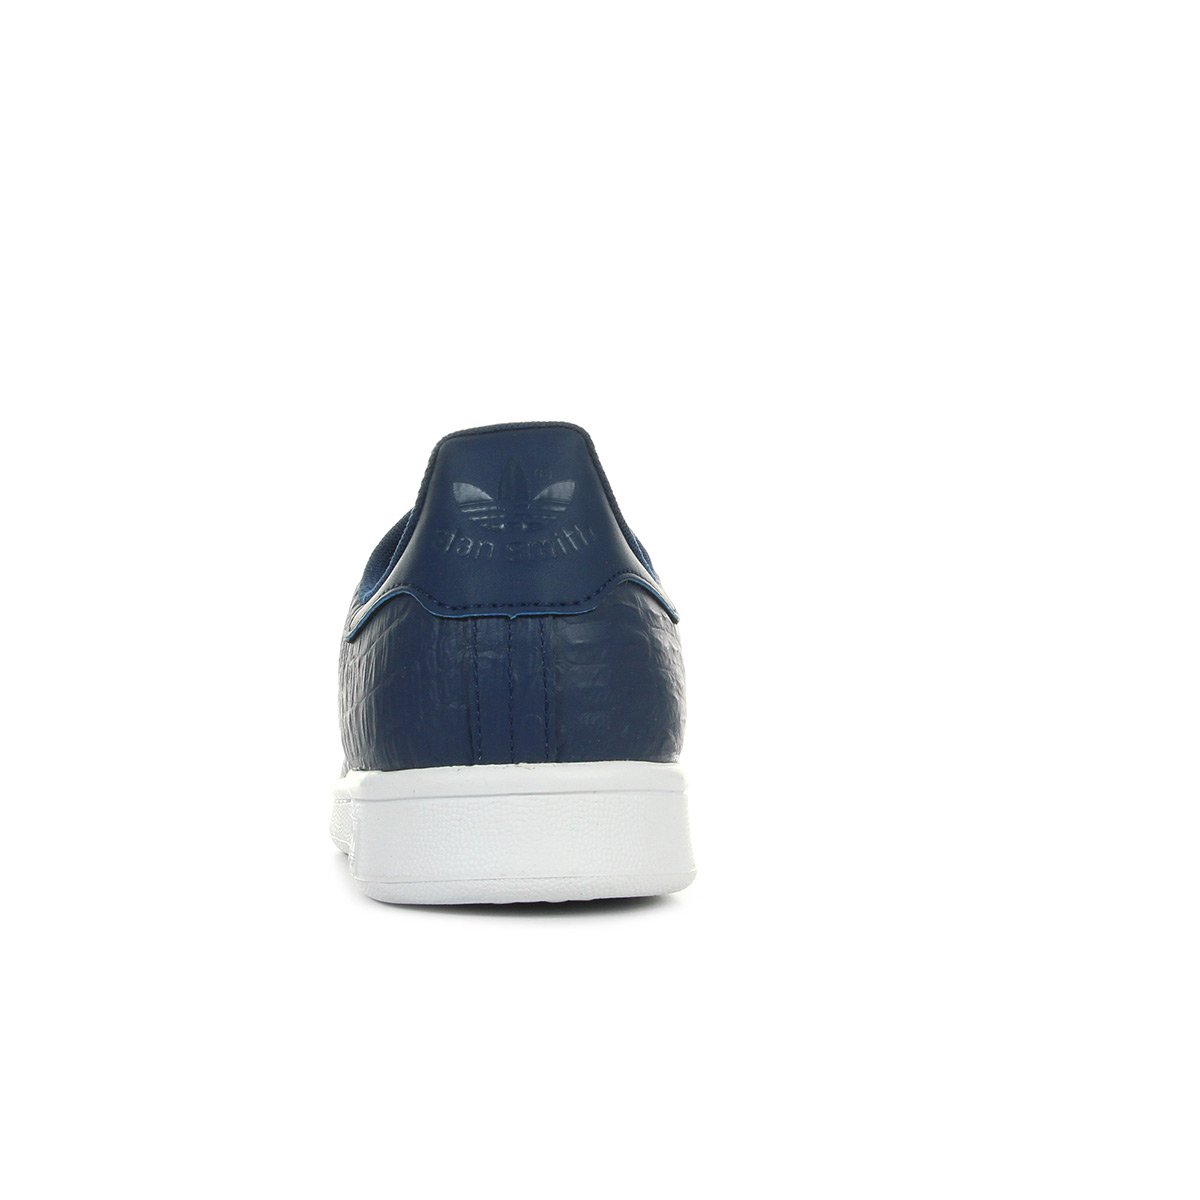 Smith Adidas Stan Mode Aq2730Baskets Homme uJ3cTl5FK1